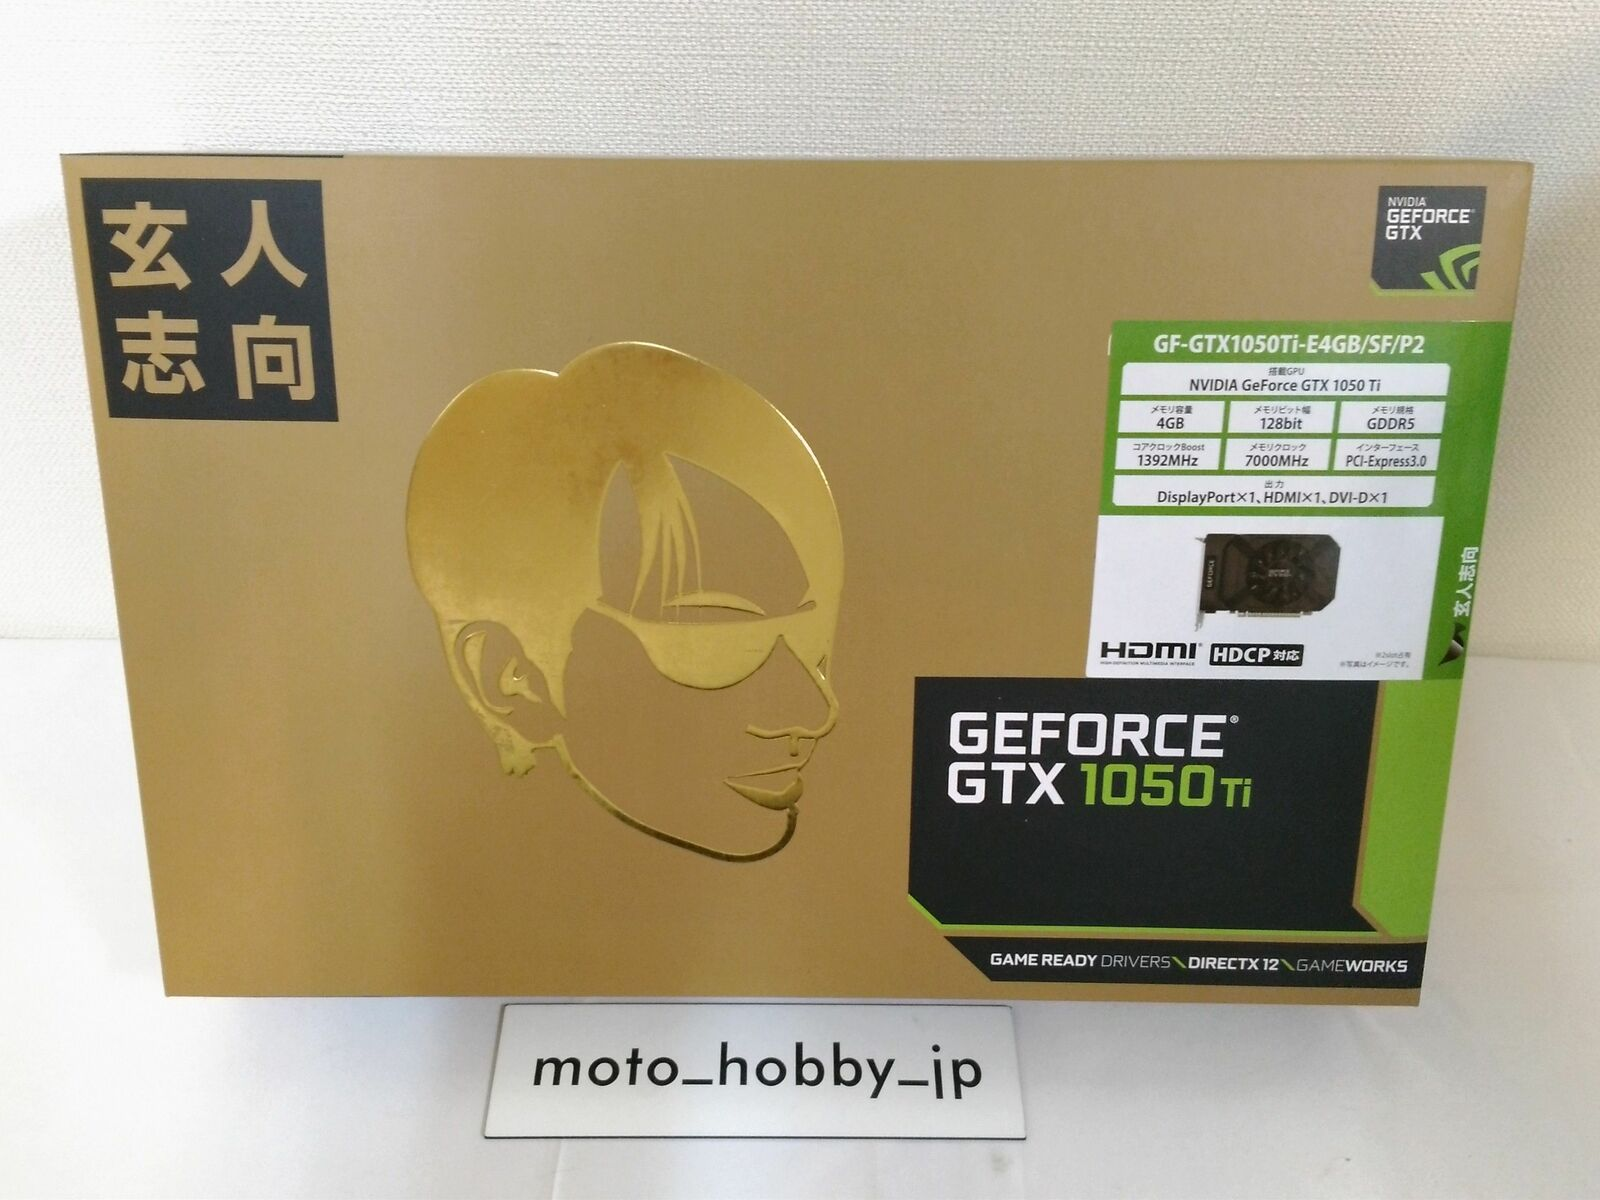 Kurouto Shikou Graphic board NVIDIA GeForce GTX1050Ti GDDR5 4GB from Japan